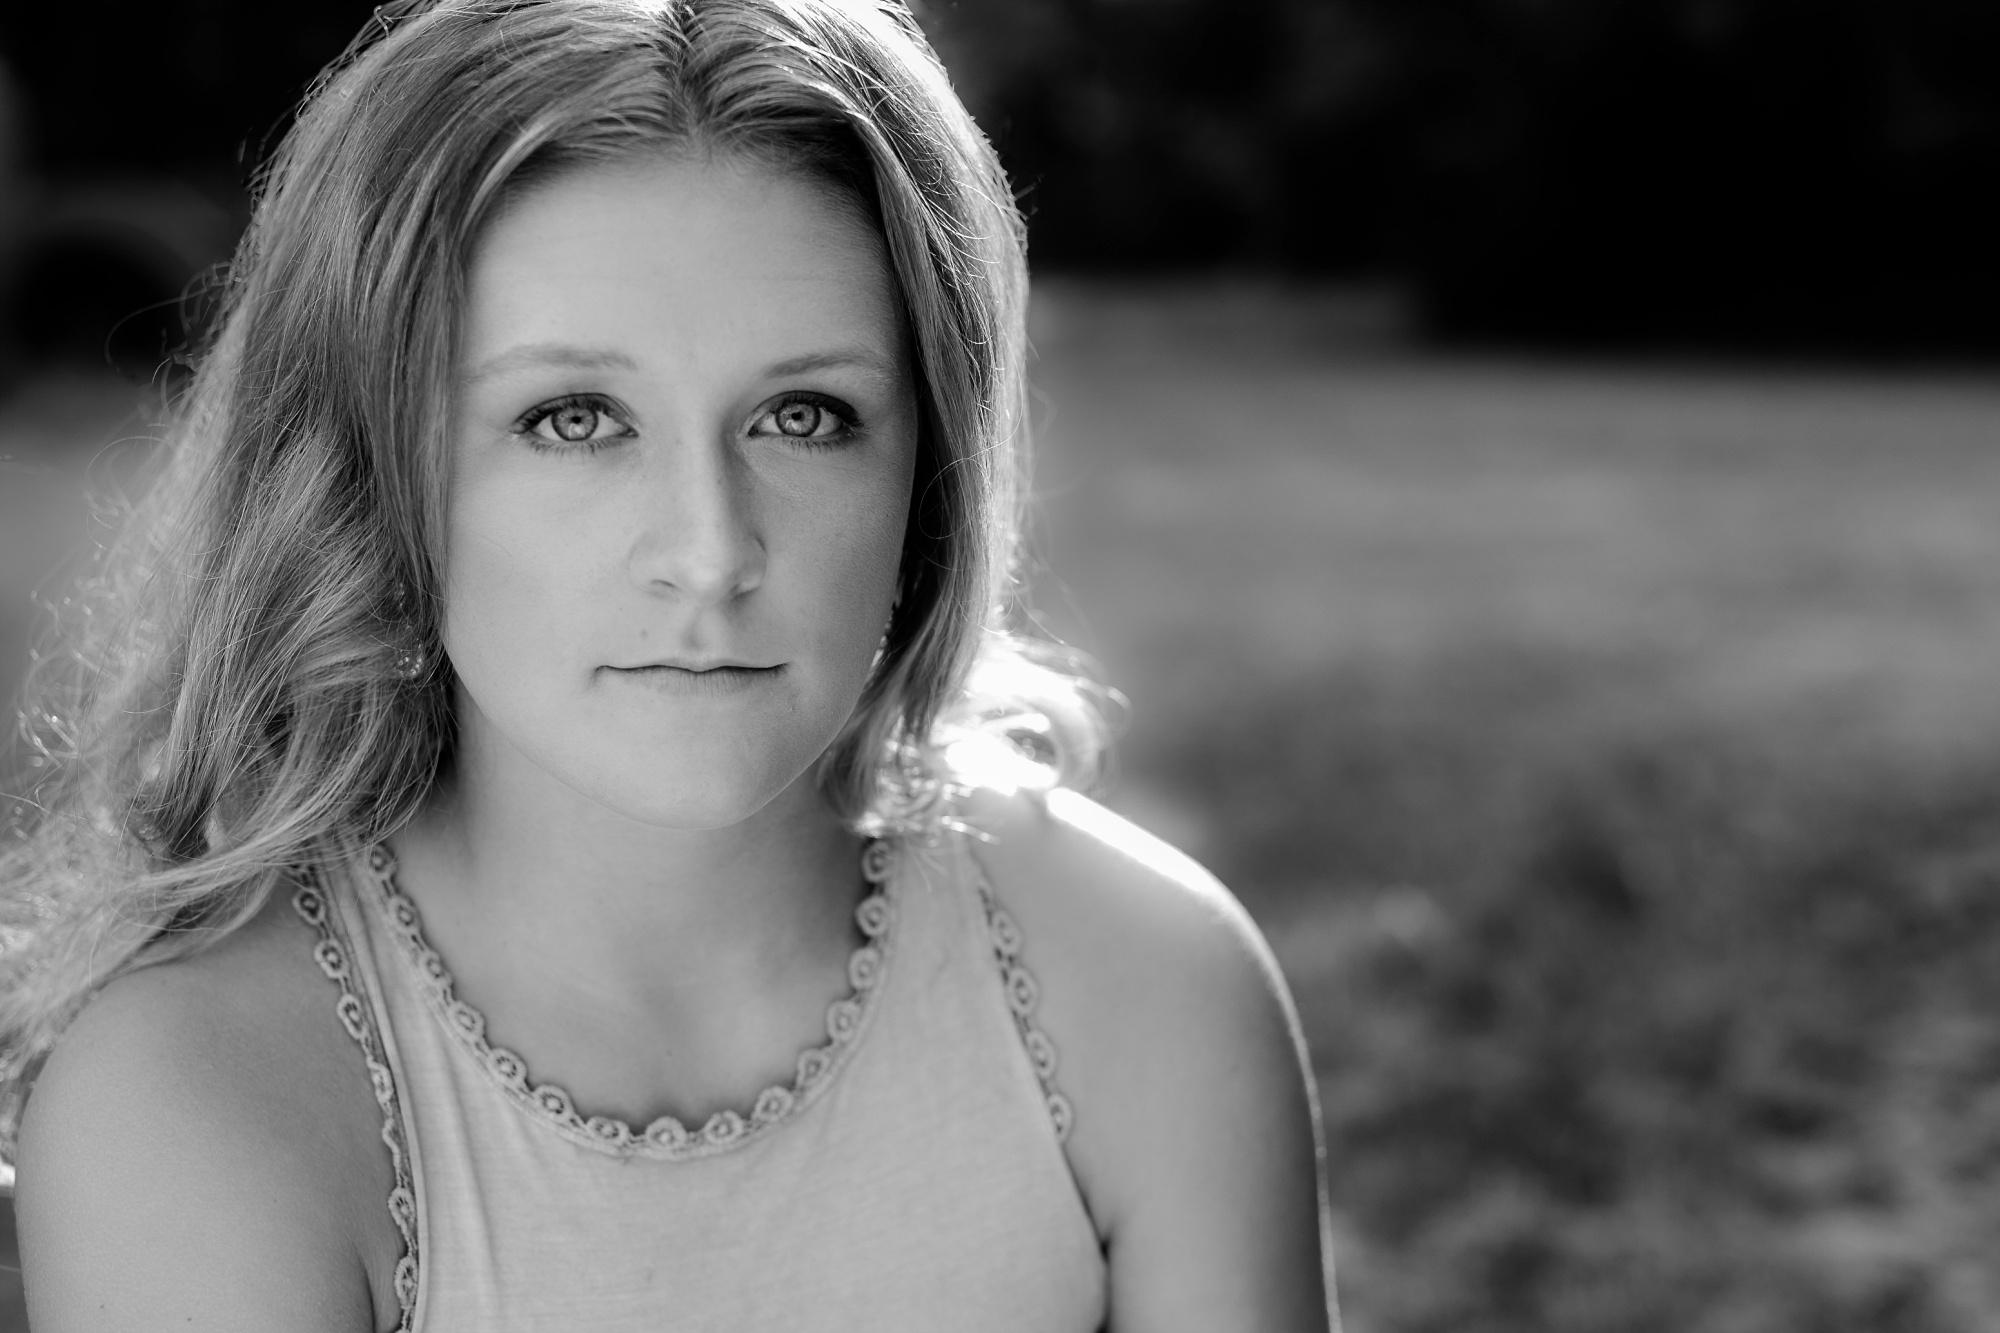 Country Styled, Lakeside High School Senior Girl Session by Amber Langerud Photography near Audubon, MN | Emma